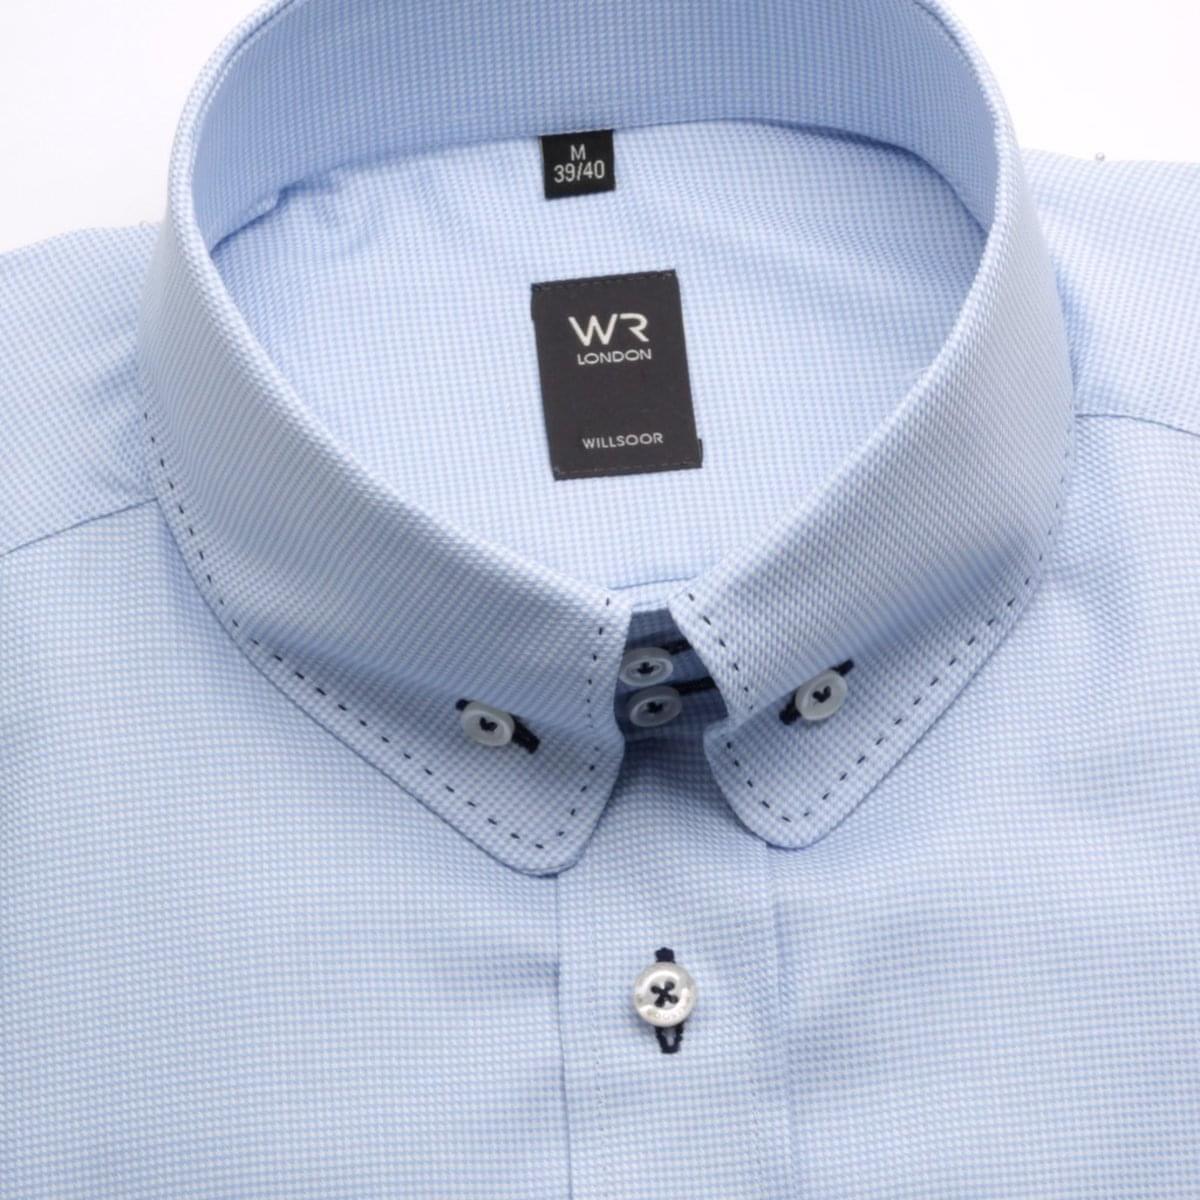 Willsoor Pánská košile WR London (výška 176-182) 1937 176-182 / L (41/42)